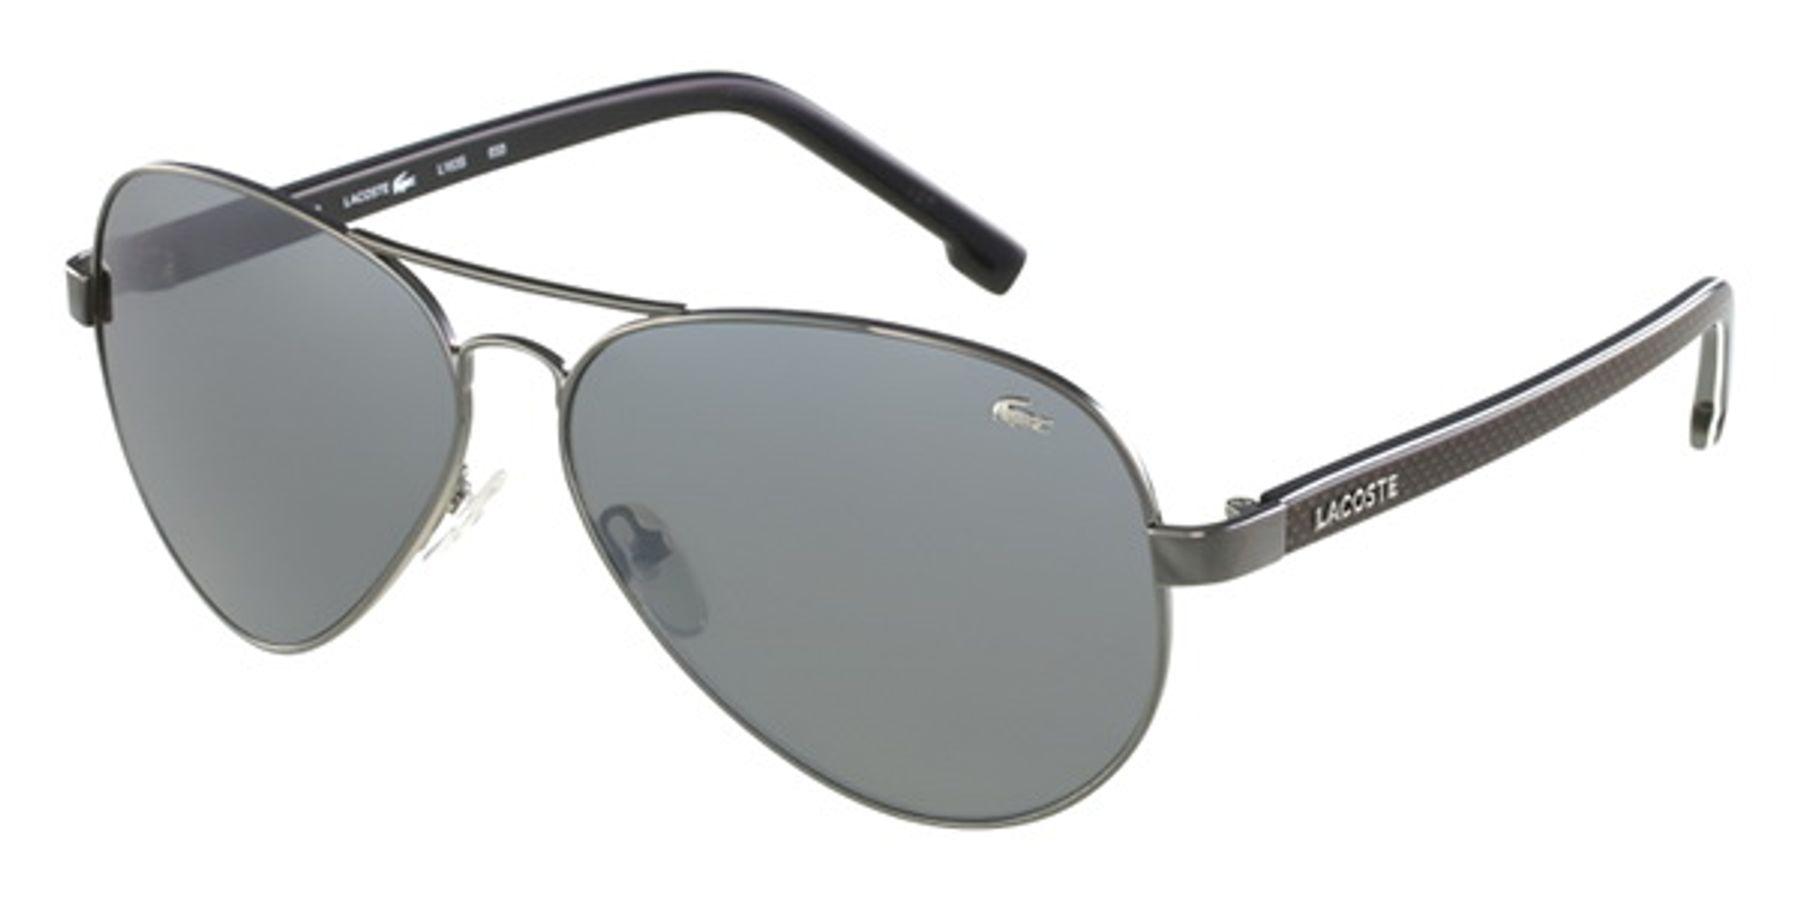 Mắt Kính Lacoste L163S 033 Gunmetal Grey Unisex